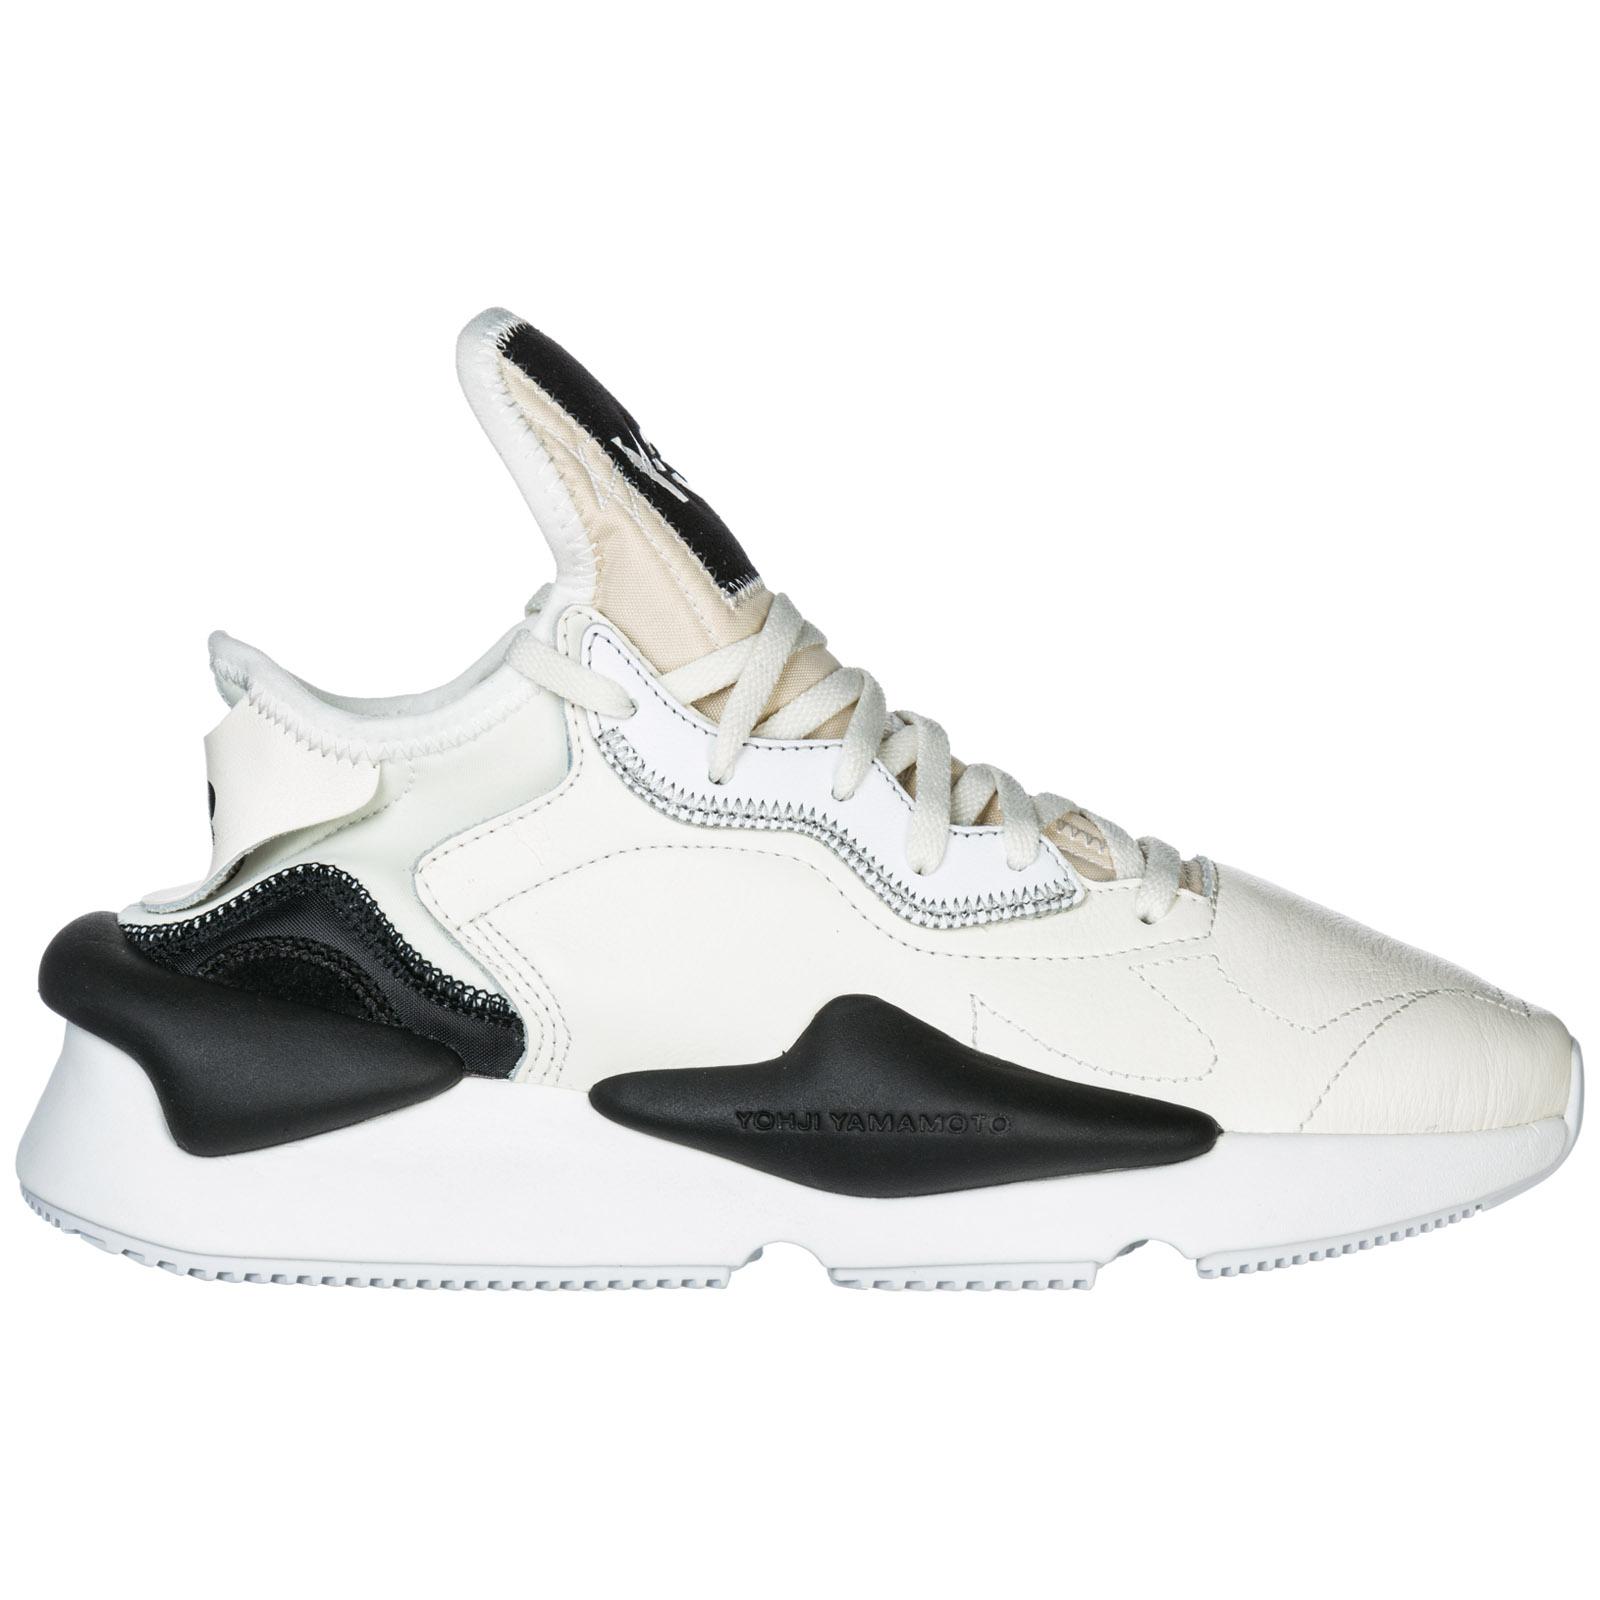 meet da905 093f9 Scarpe sneakers uomo in pelle kaiwa ...